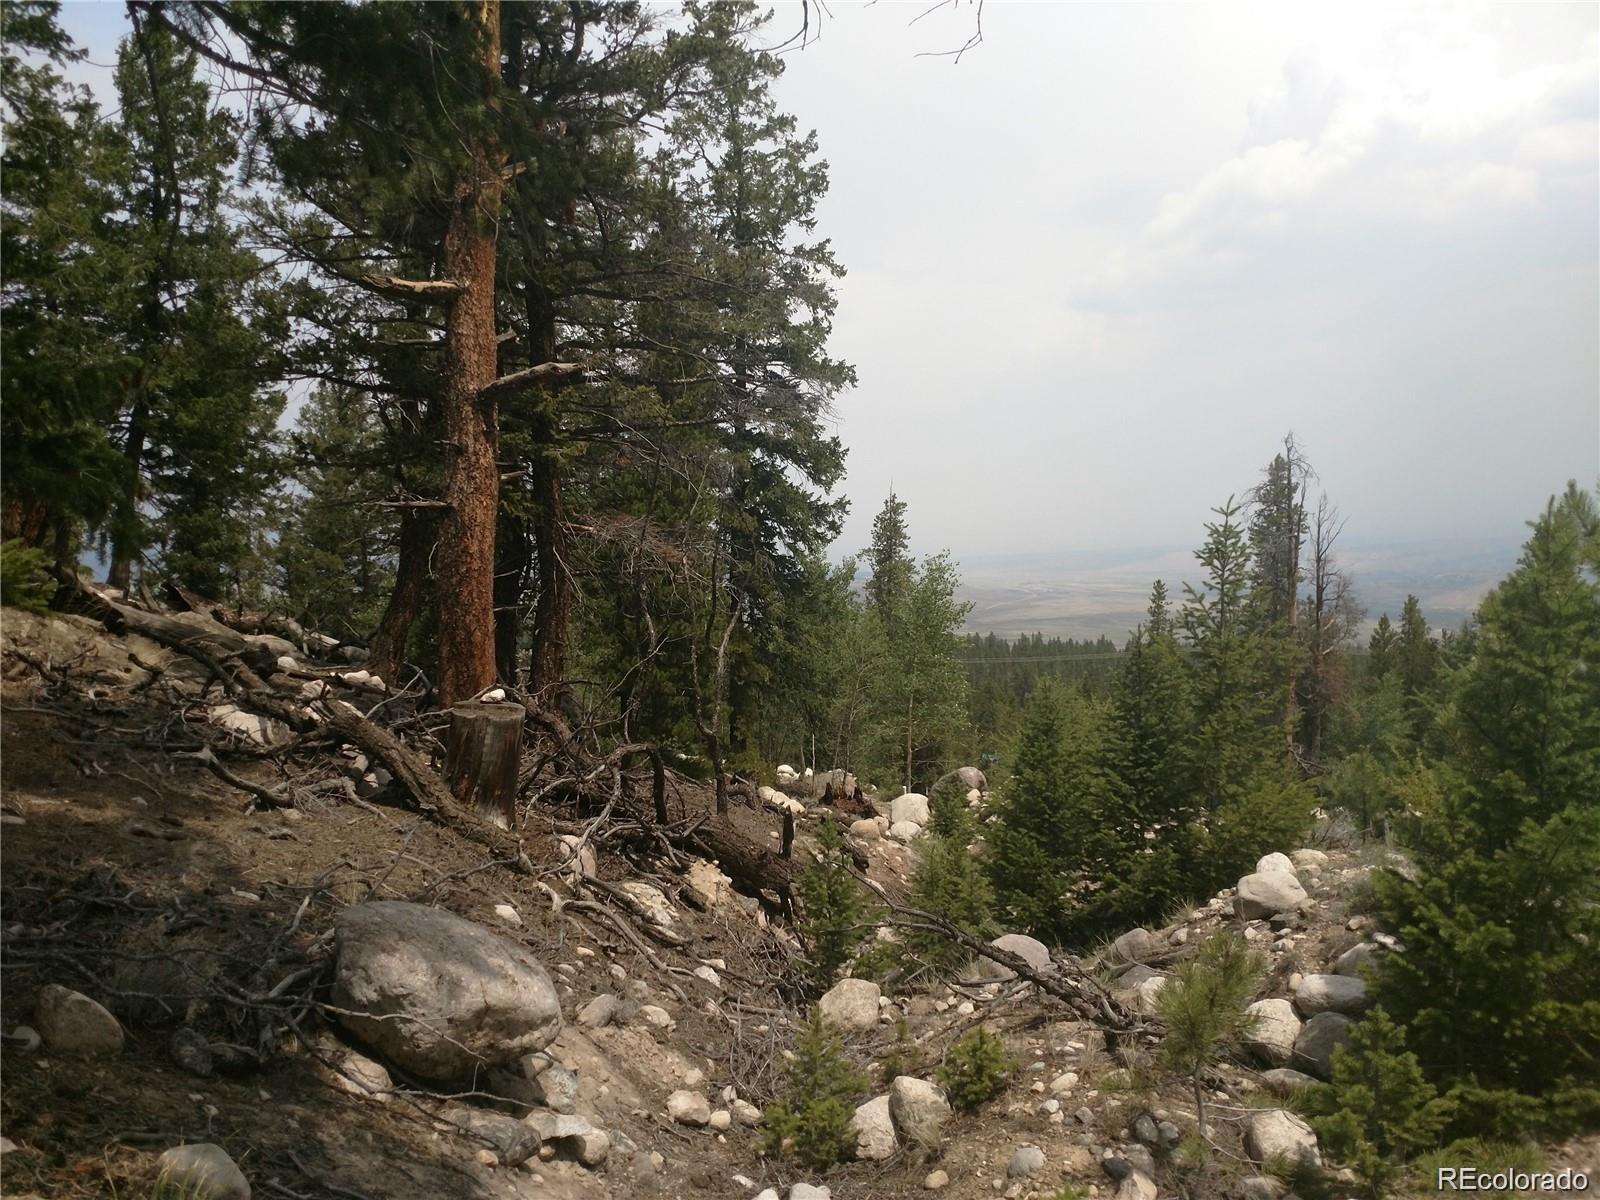 MLS# 8880034 - 3 - 368 Mount Elbert Drive, Twin Lakes, CO 81251